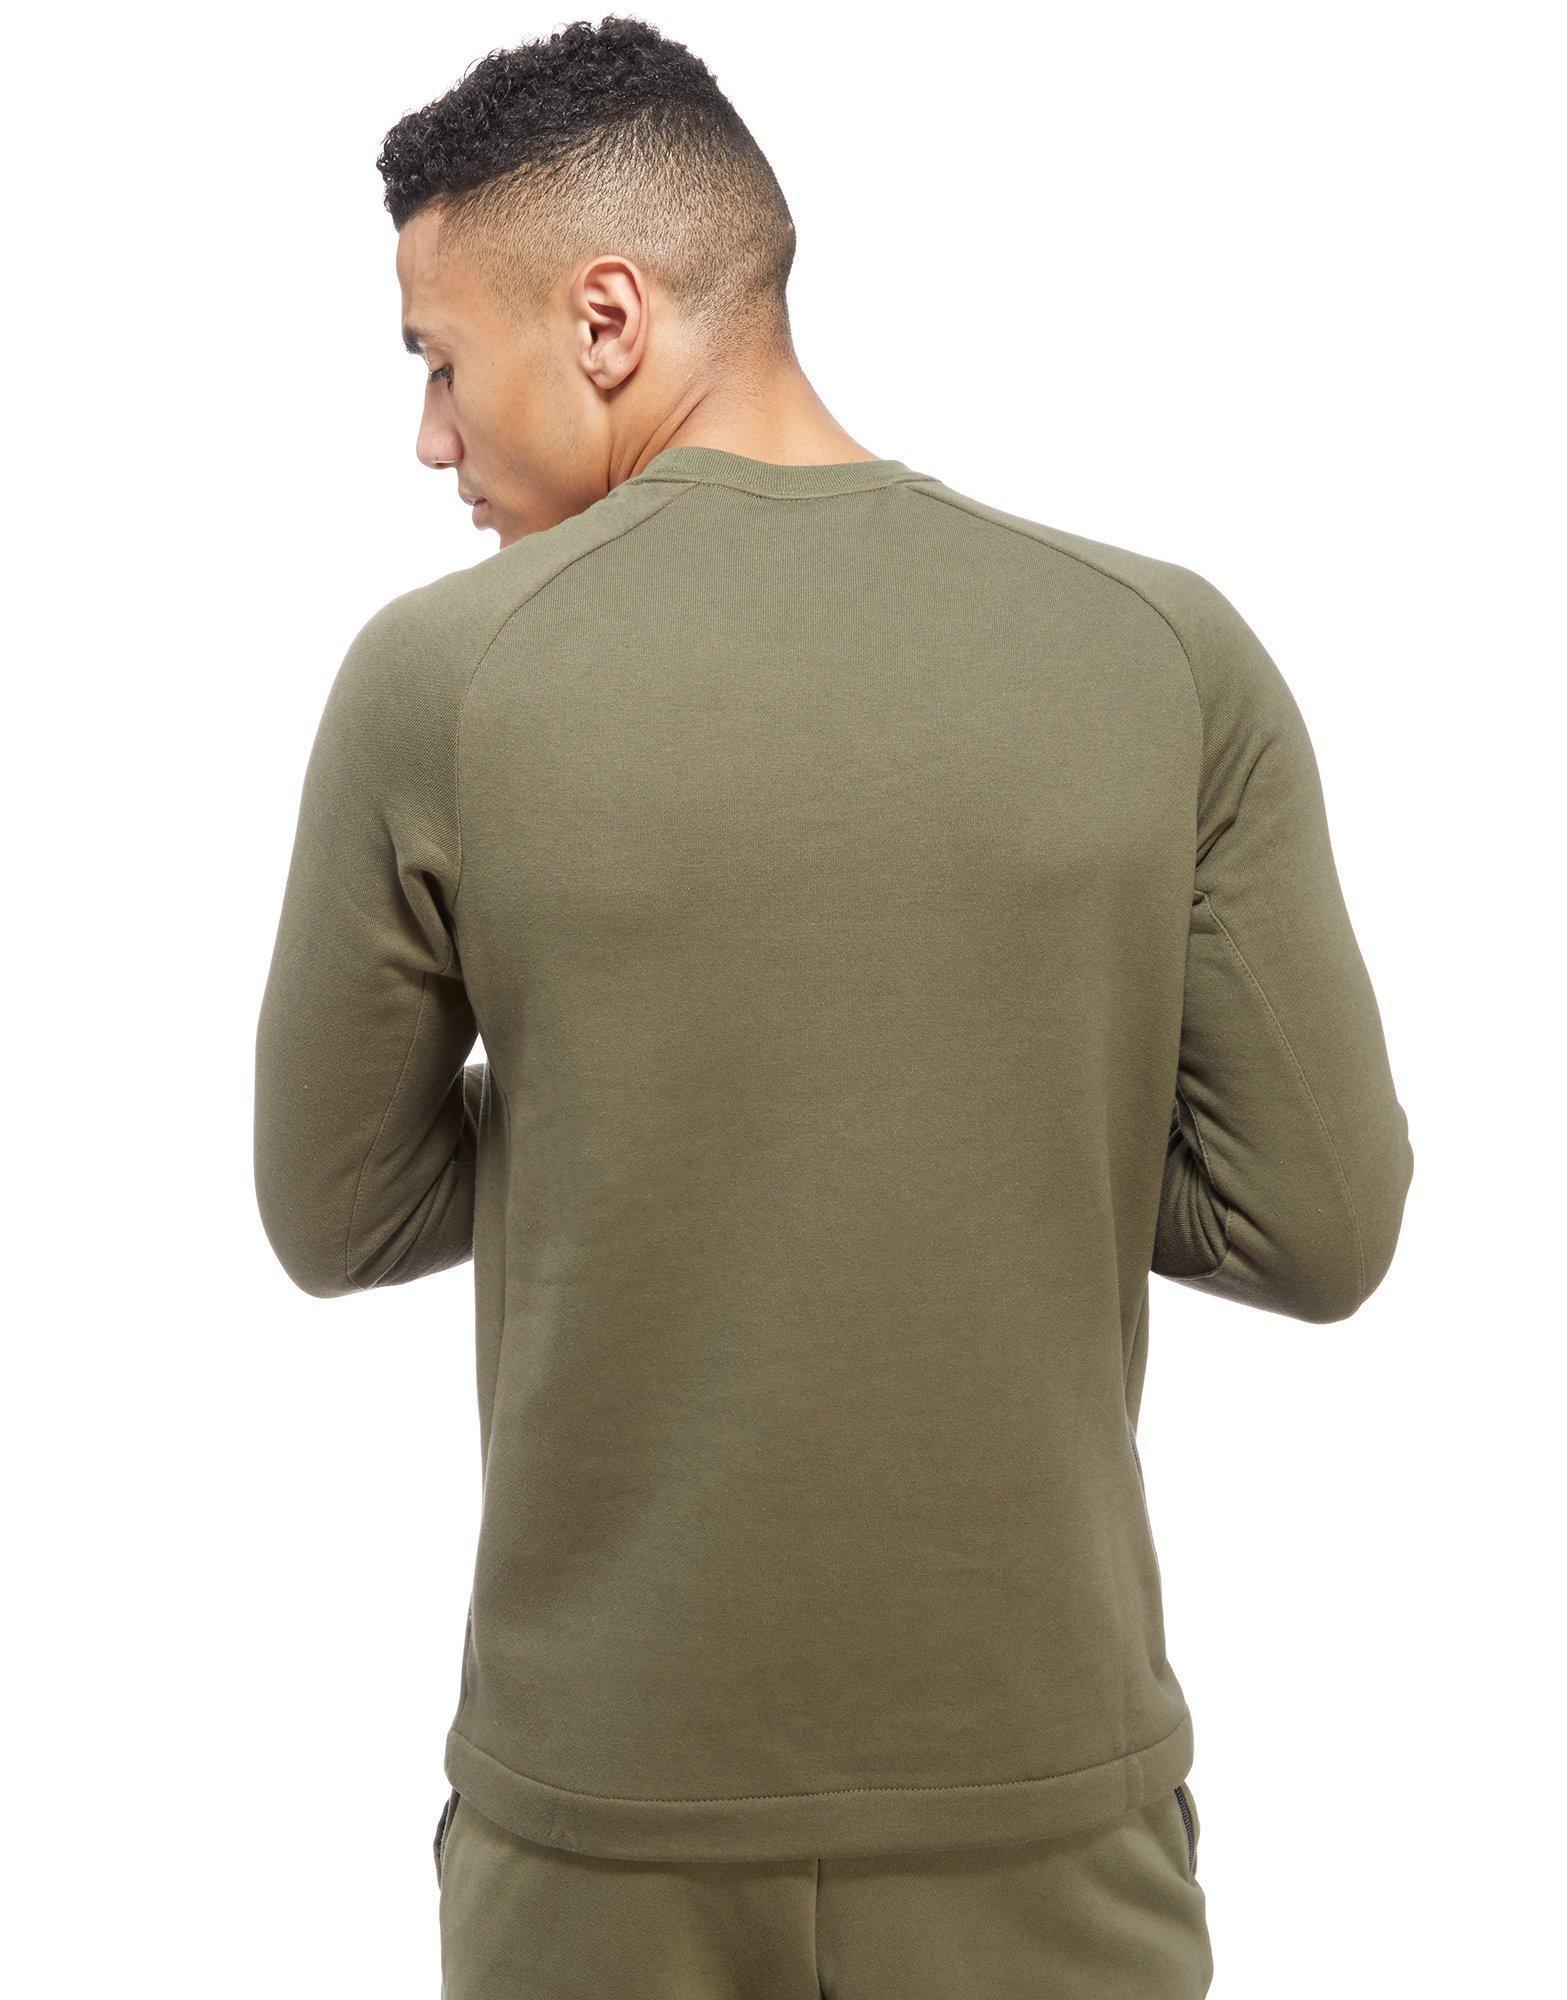 tira tonto ventilador  Nike Cotton Modern Crew Sweatshirt in Green for Men - Lyst